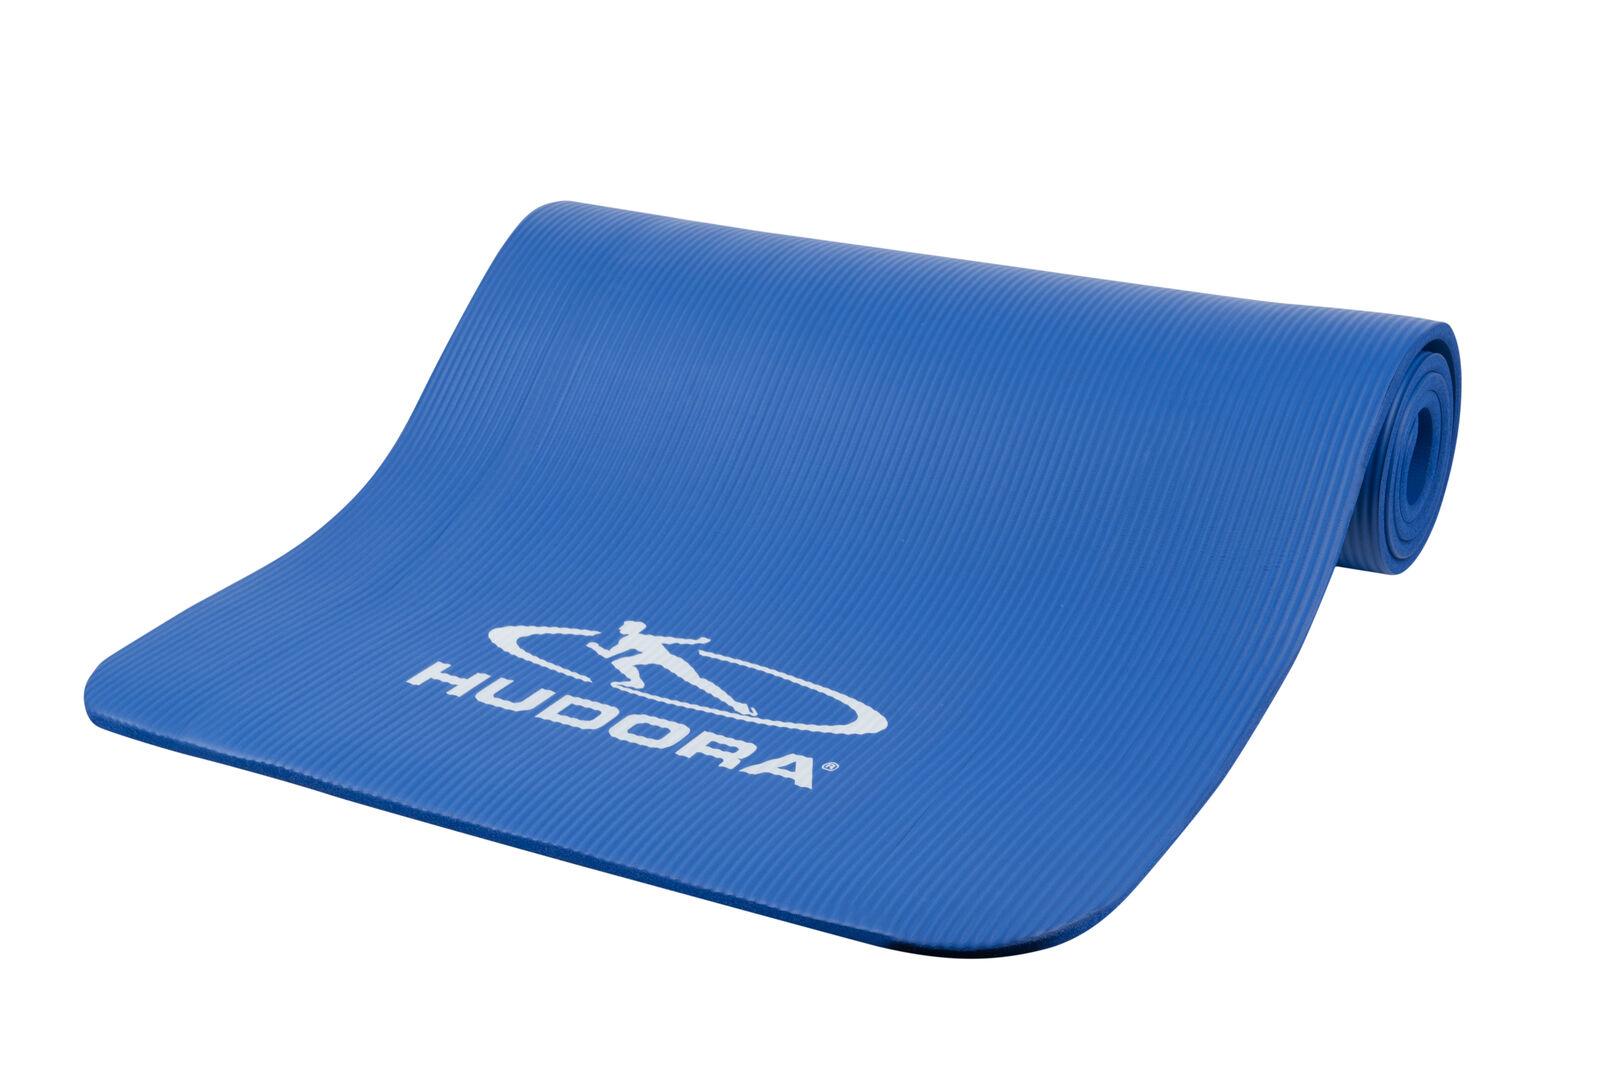 Hudora Fitnessmatte   180x60x1cm   blau   Yogamatte Sportmatte Turnmatte    Economy